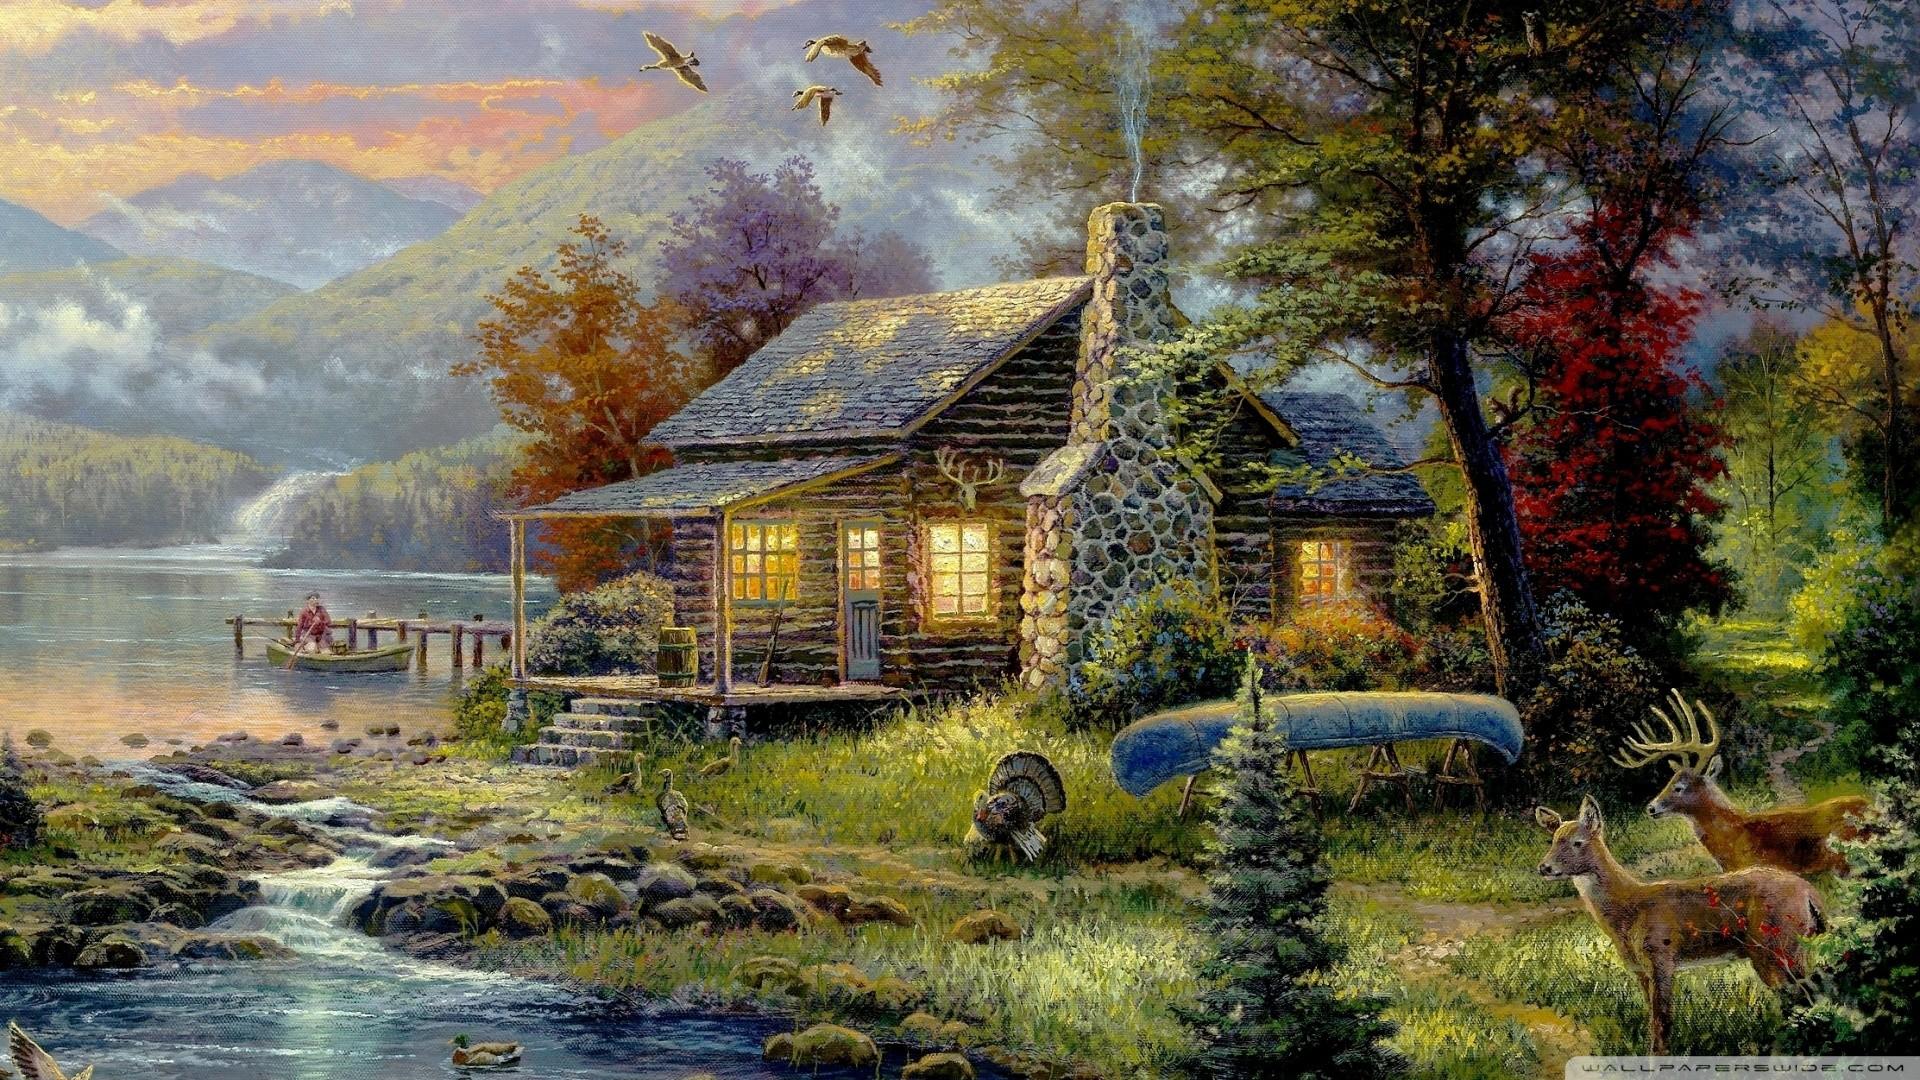 2392x1592 Wallpapers Pictorial art Thomas Kinkade, free desktop photo 281744 · Download